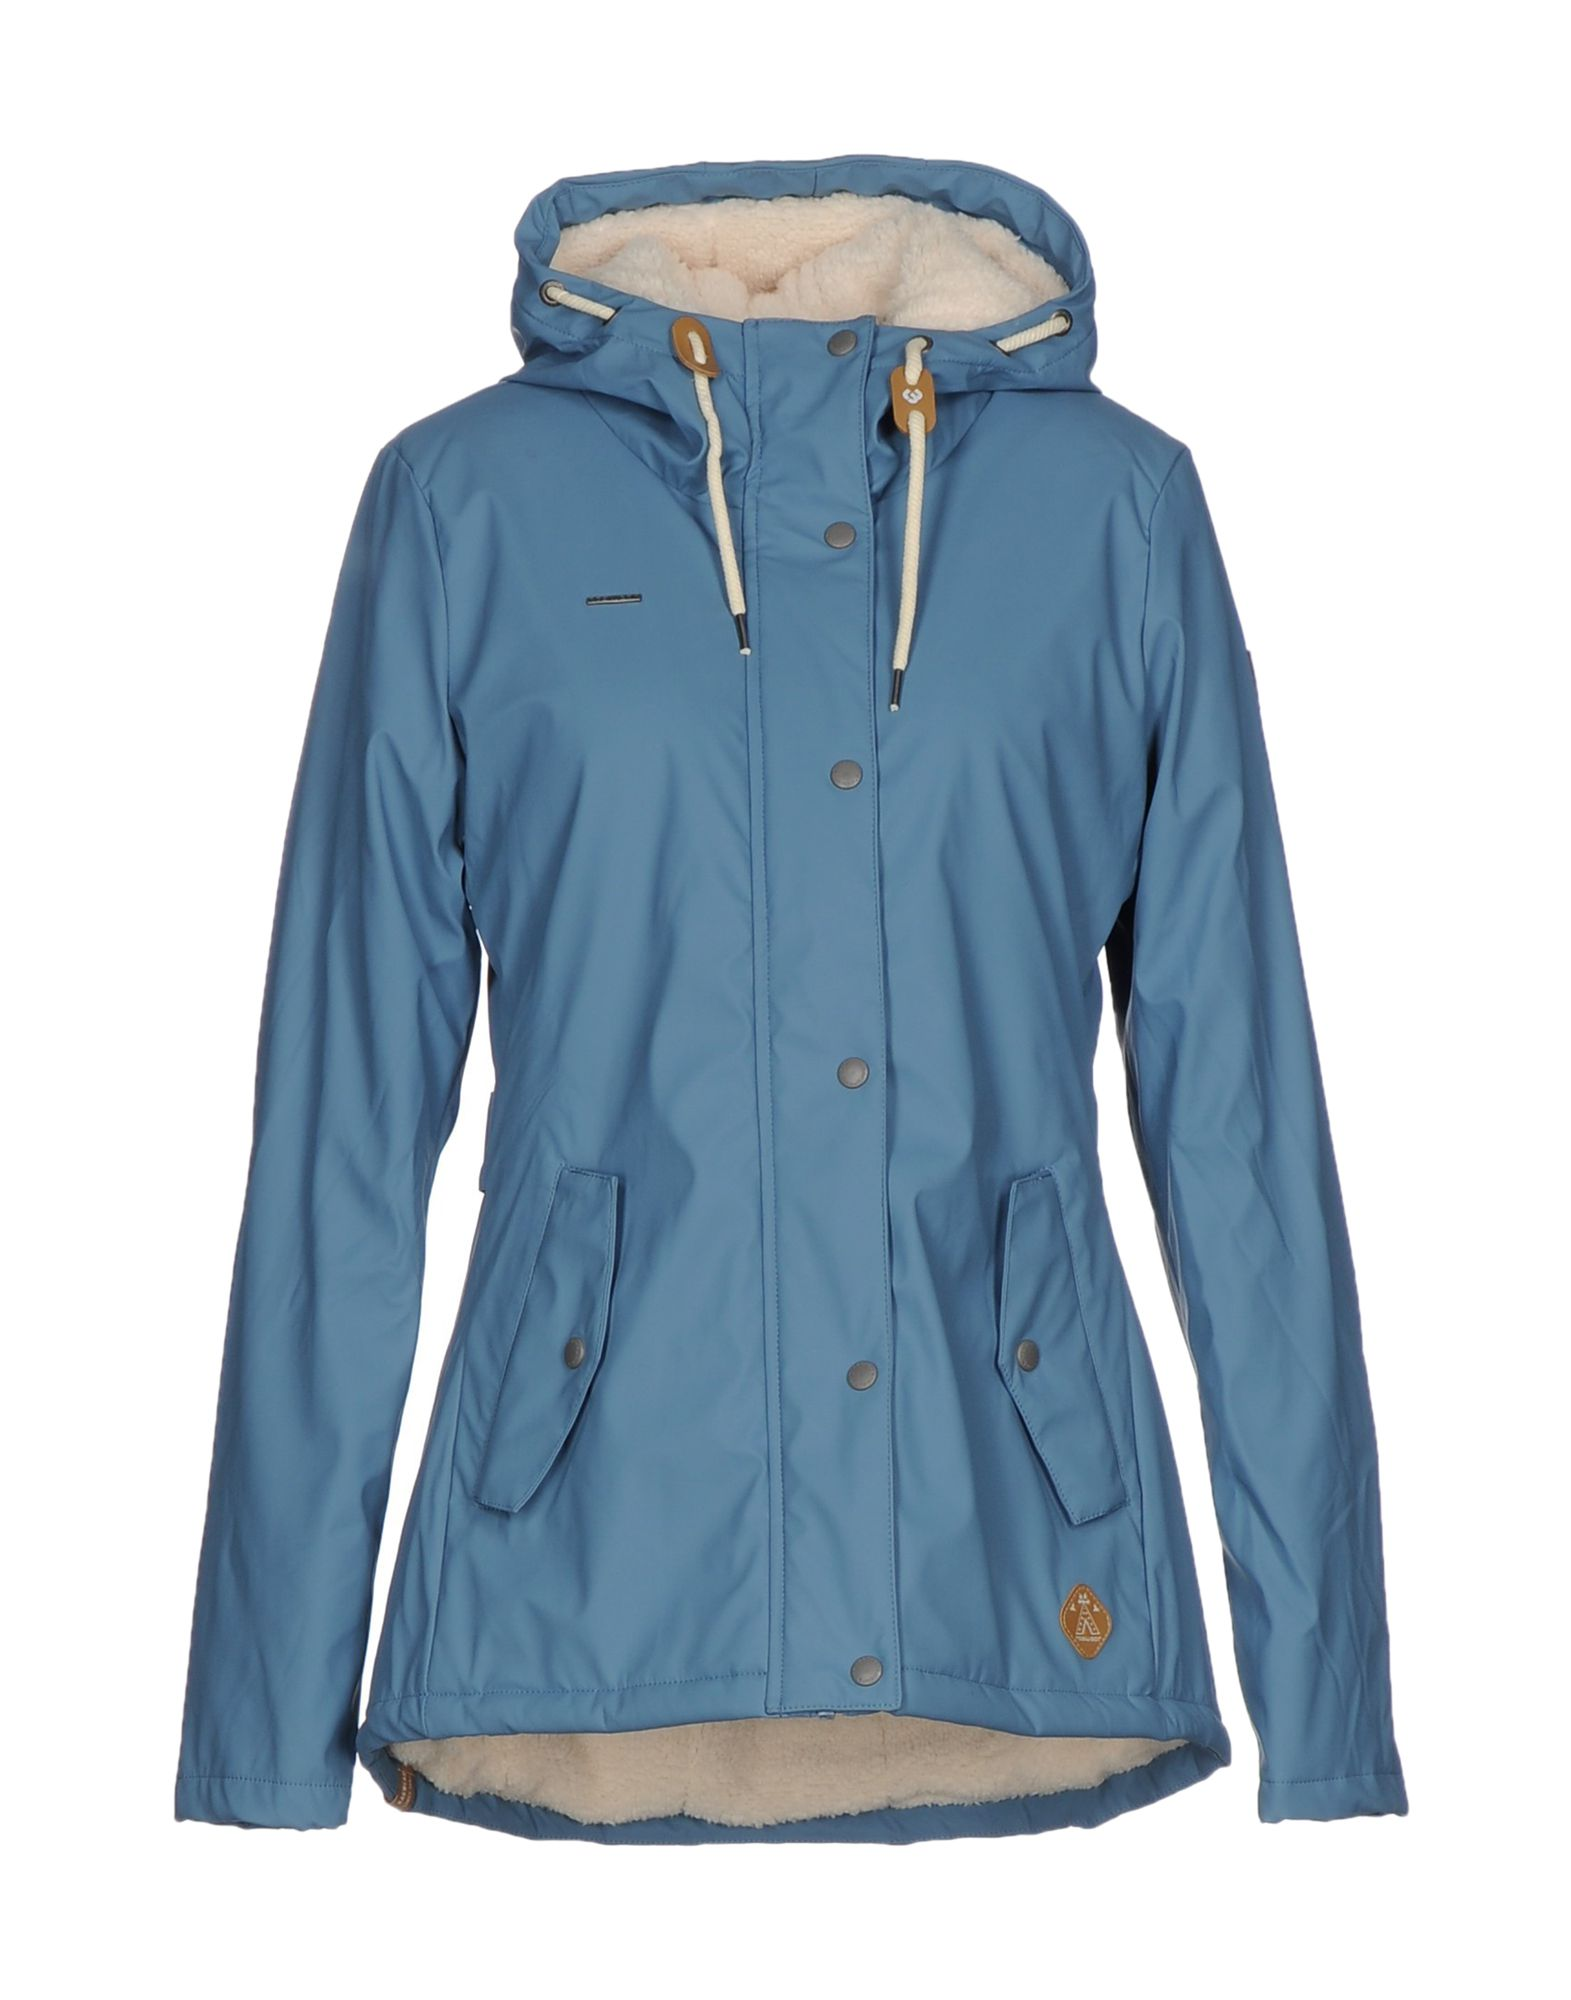 RAGWEAR Damen Jacke Farbe Azurblau Größe 4